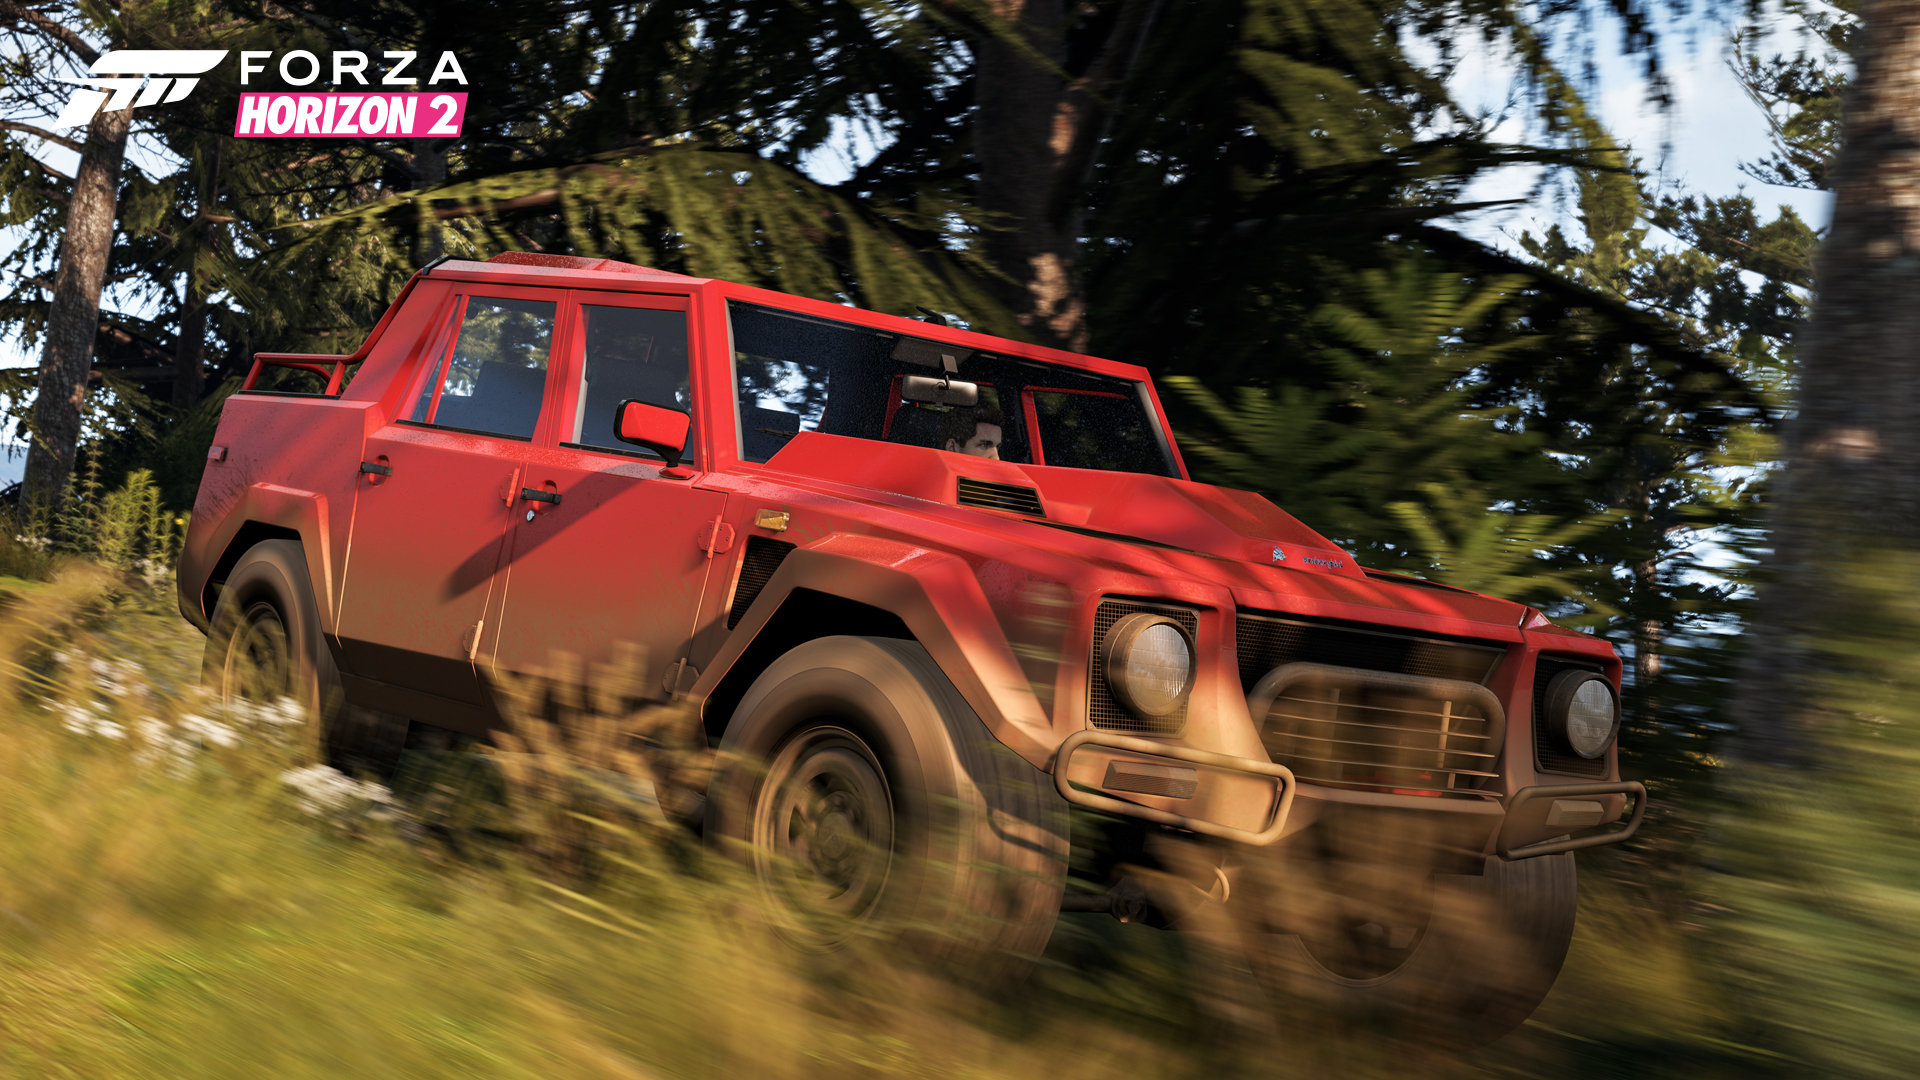 Vyšel balíček Top Gear pro Forza Horizon 2 105503